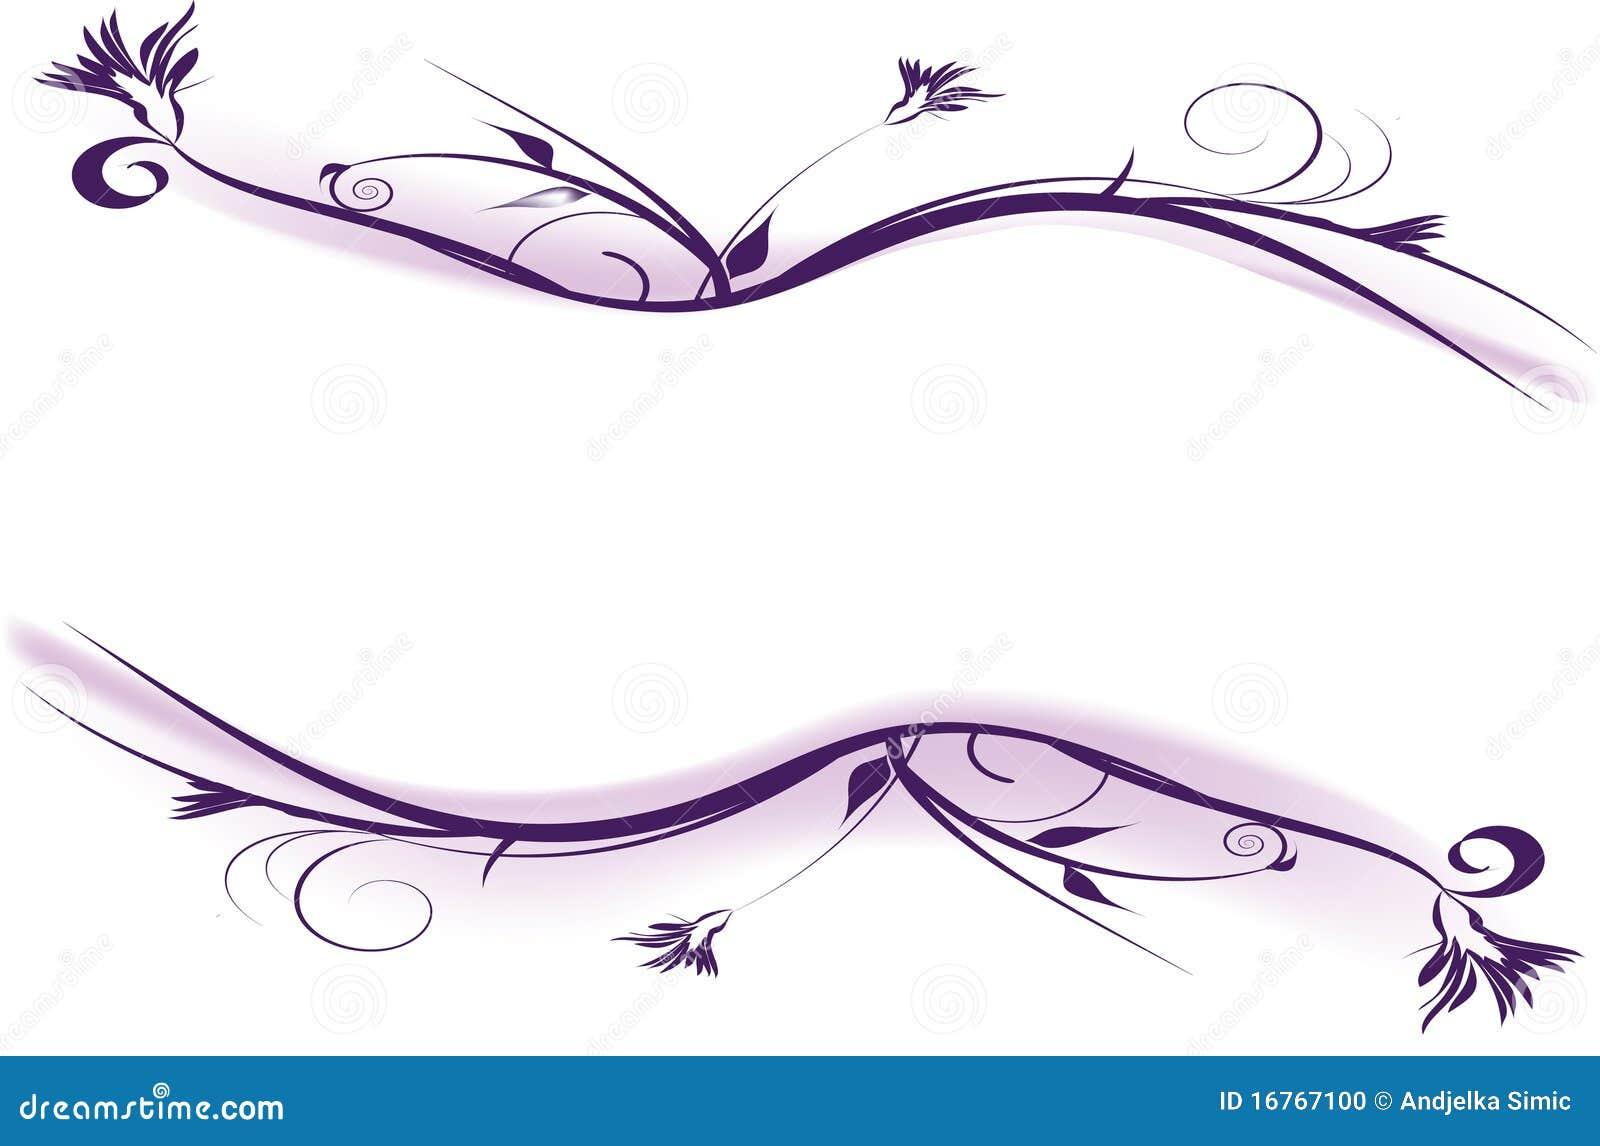 Purple Flowers Decorative Design Stock Photo - Image: 16767100